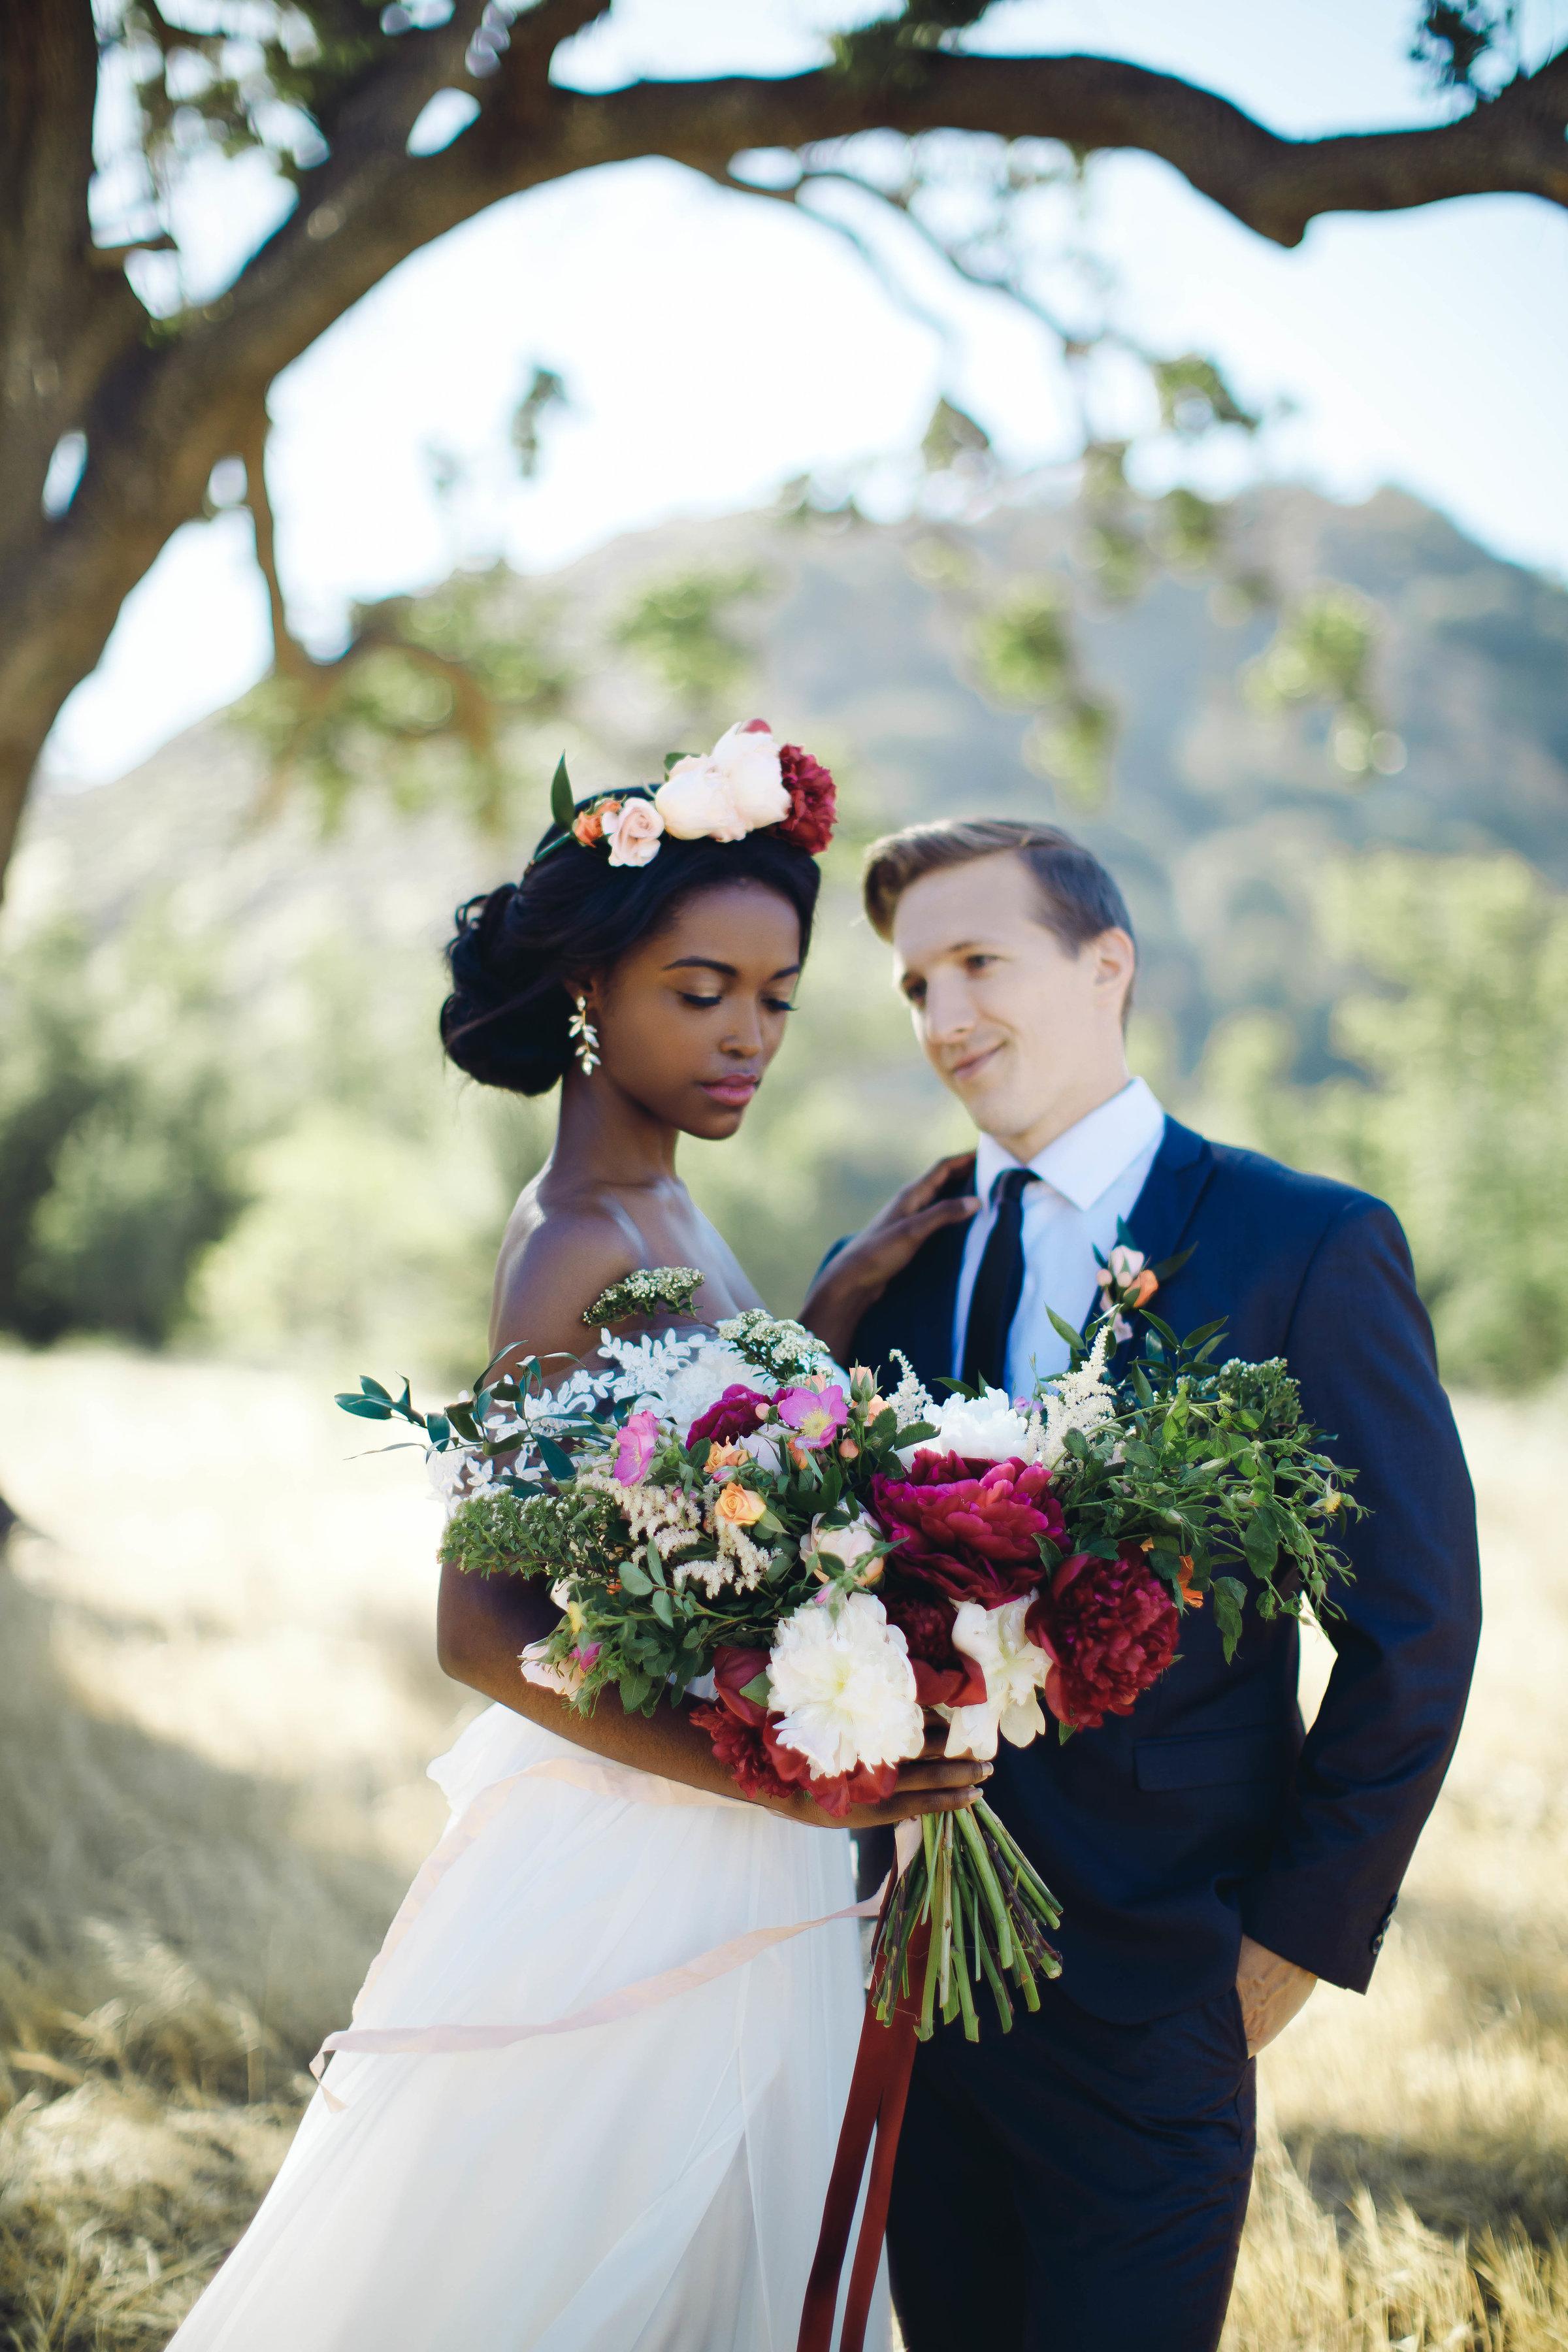 Lush_Florals_Peony_Sibyl_Sophia_Bouquet_Crown.jpg